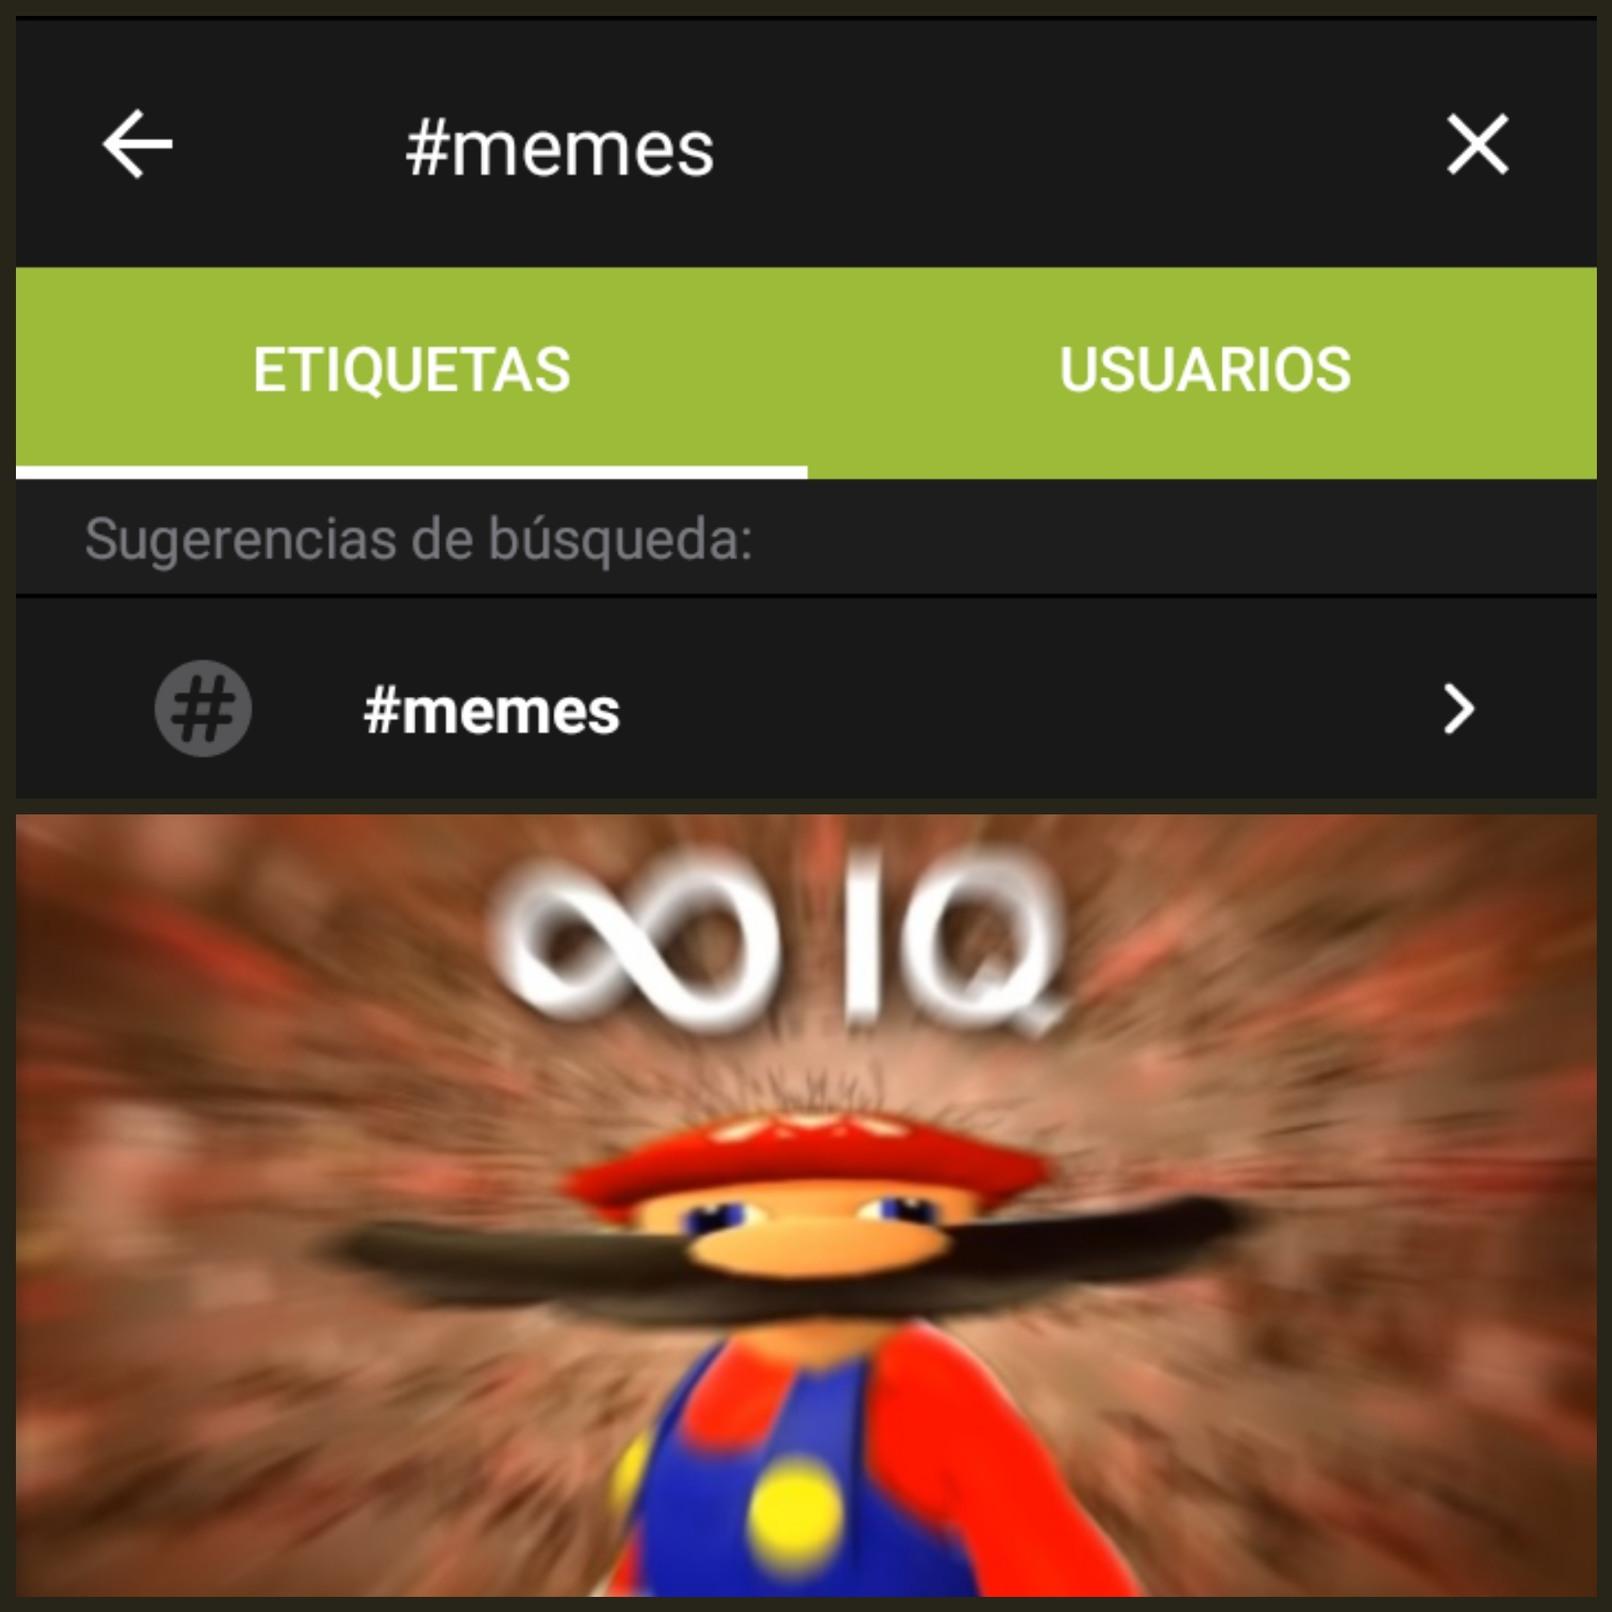 826222281819101811221111 IQ - meme